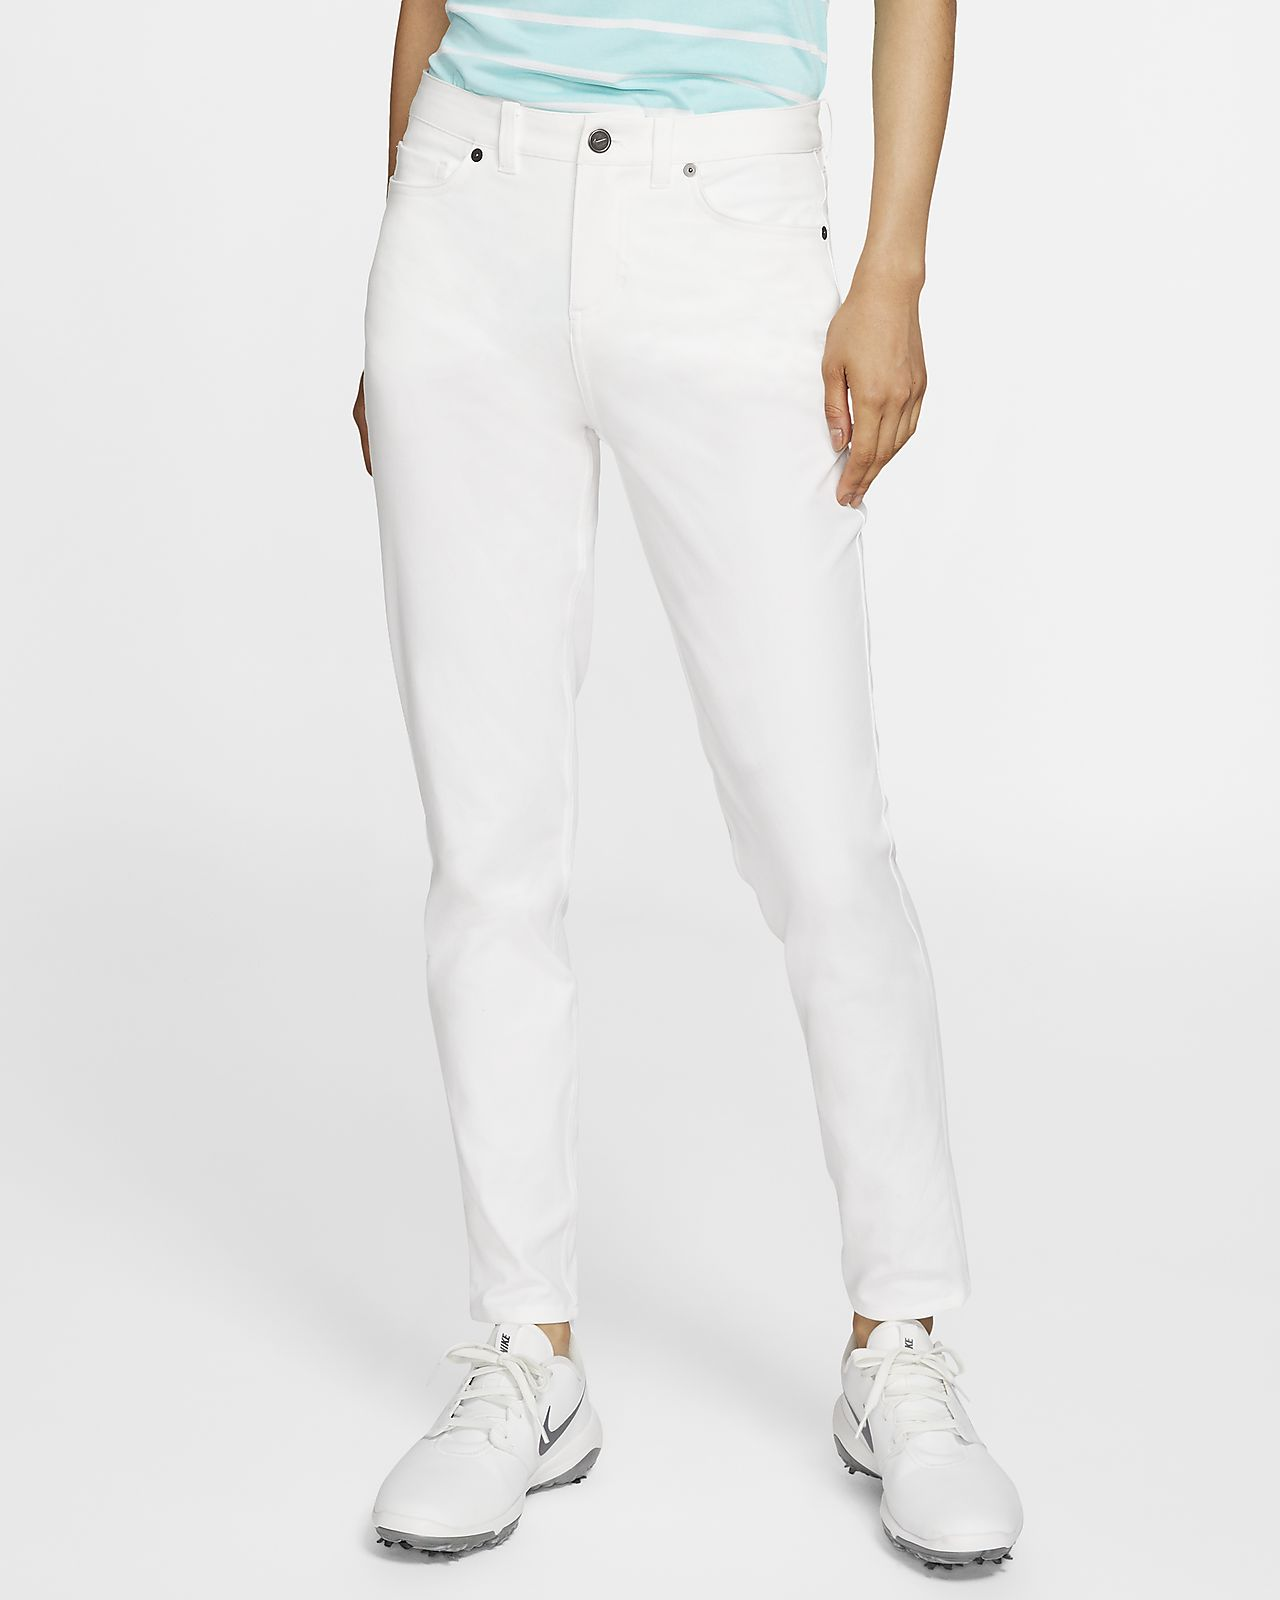 Nike Women's Slim Fit Golf Pants